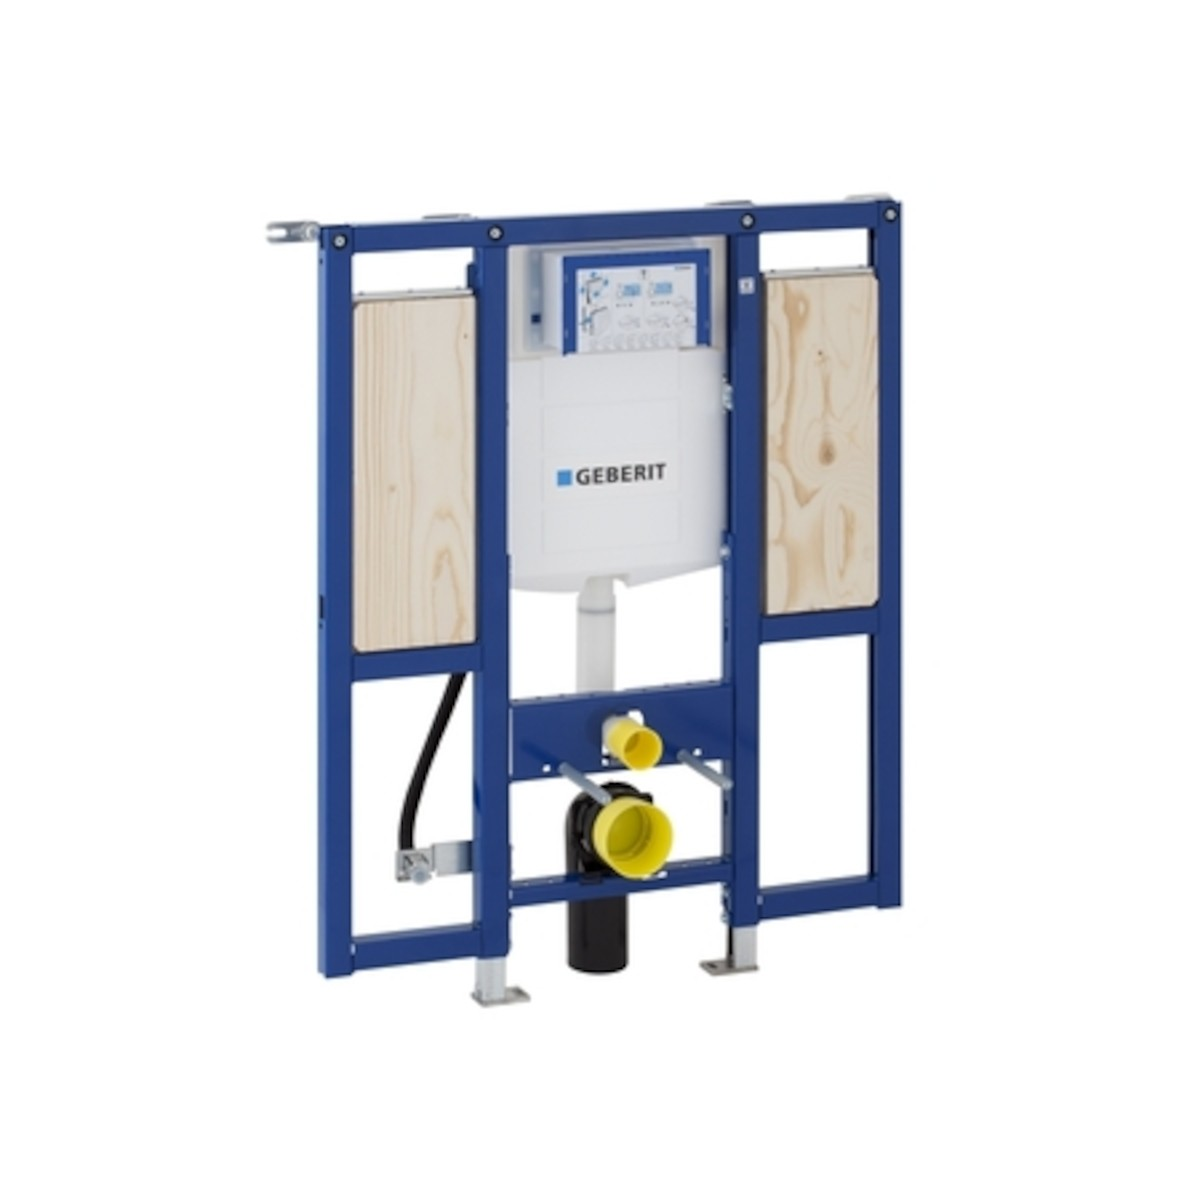 Nádržka do lehké stěny k WC Geberit Duofix 111.375.00.5